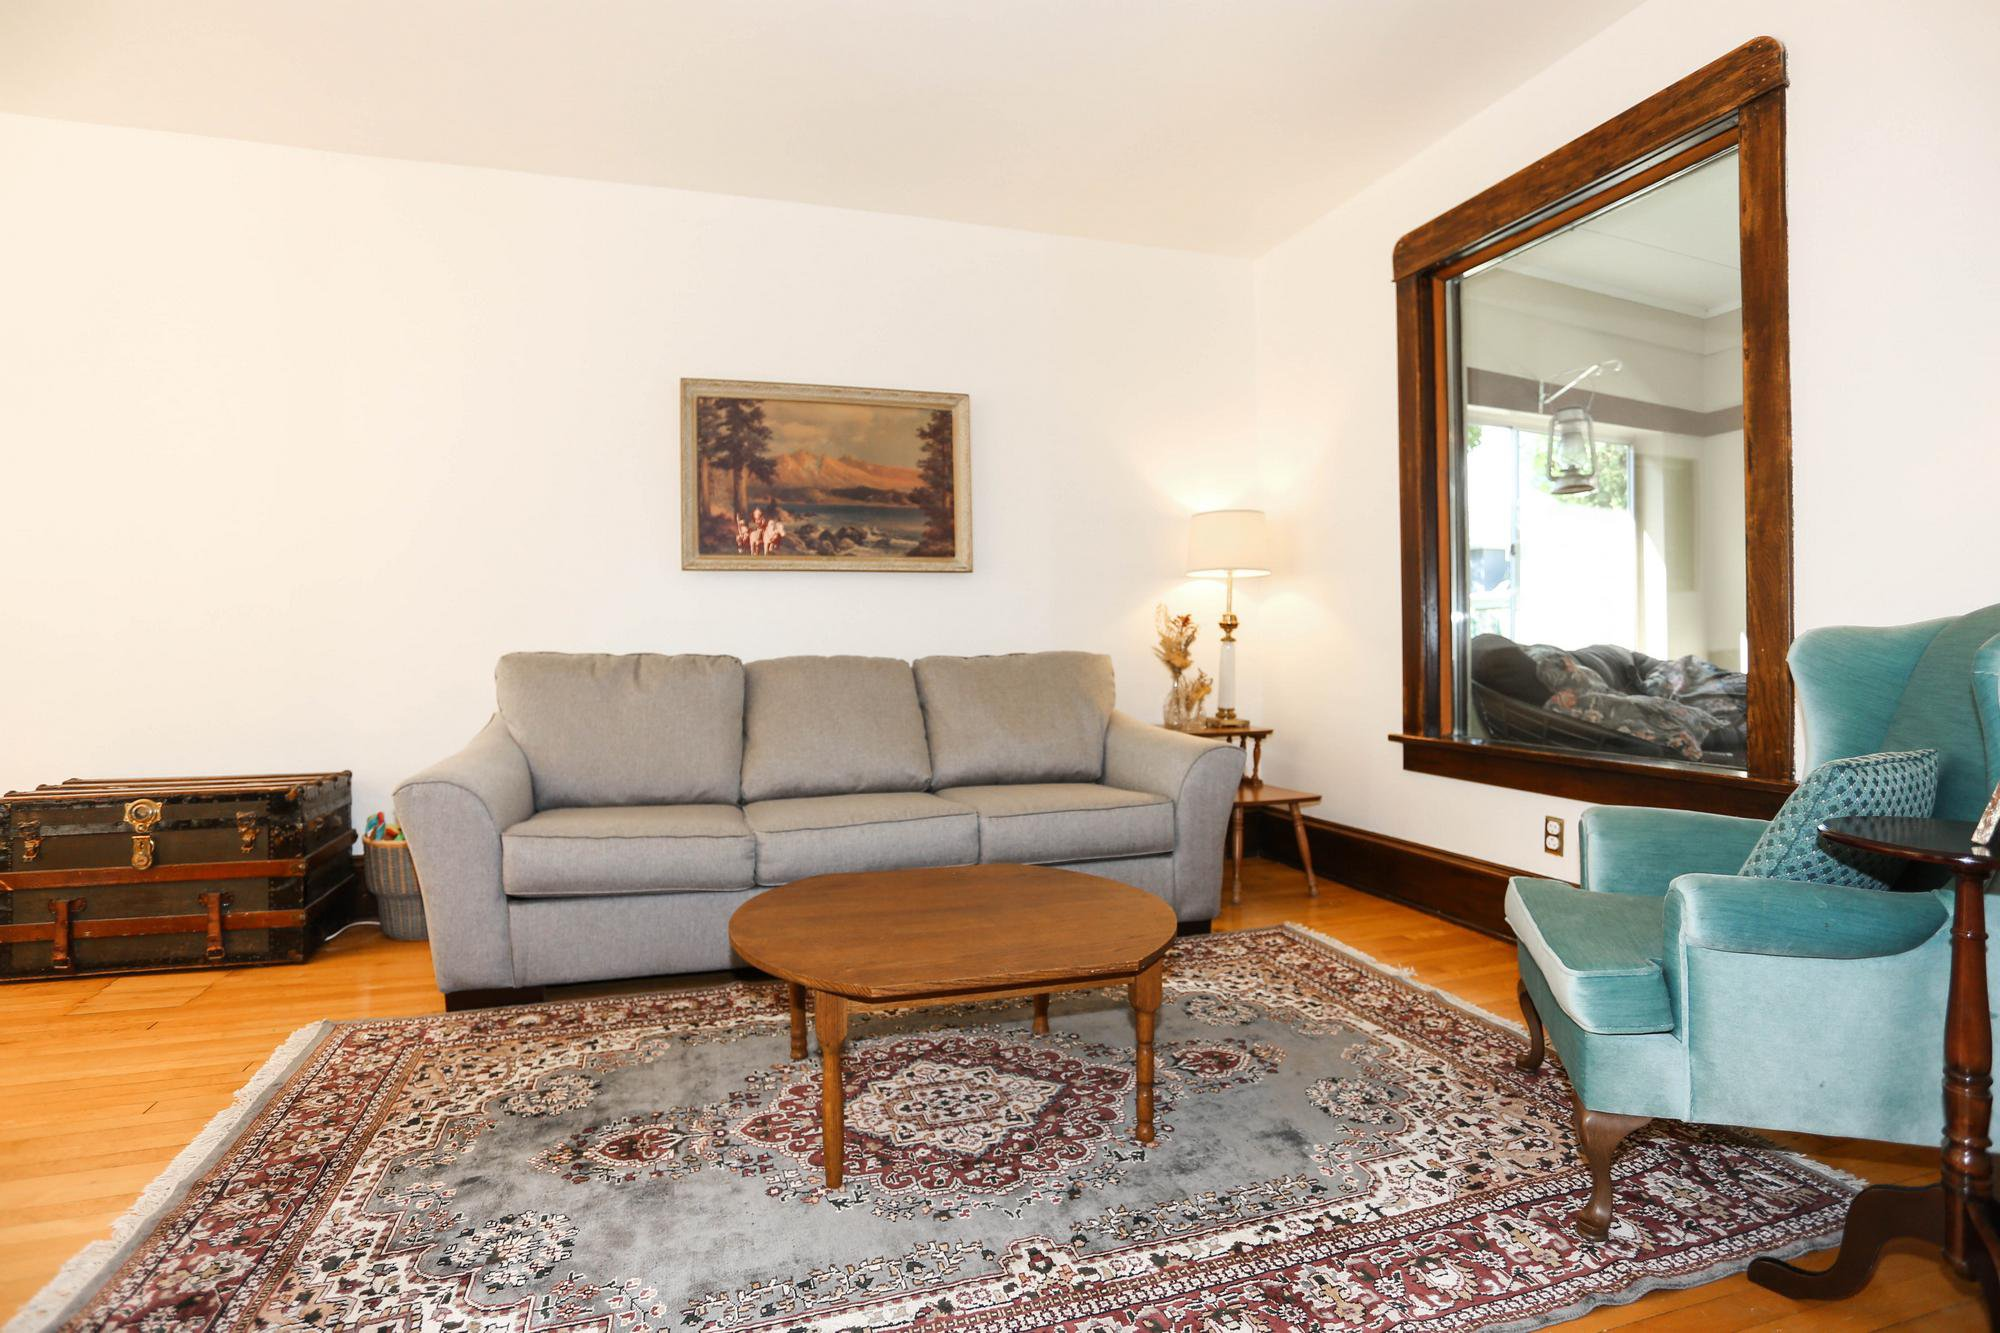 Photo 10: Photos: 105 Evanson Street in Winnipeg: Wolseley Single Family Detached for sale (5B)  : MLS®# 1821900